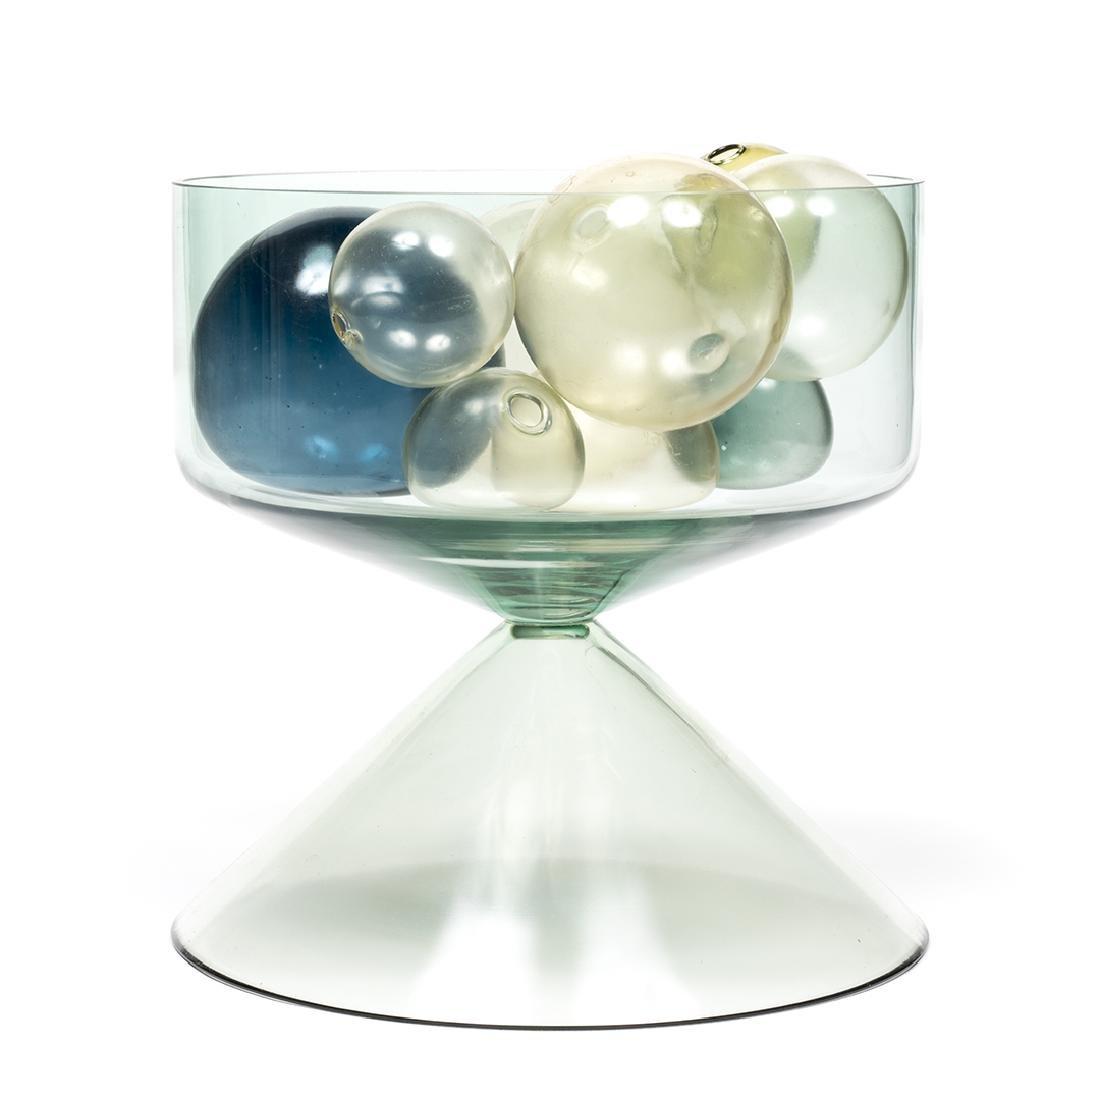 Timo Sarpaneva Style Vase With Glass Balls - 2